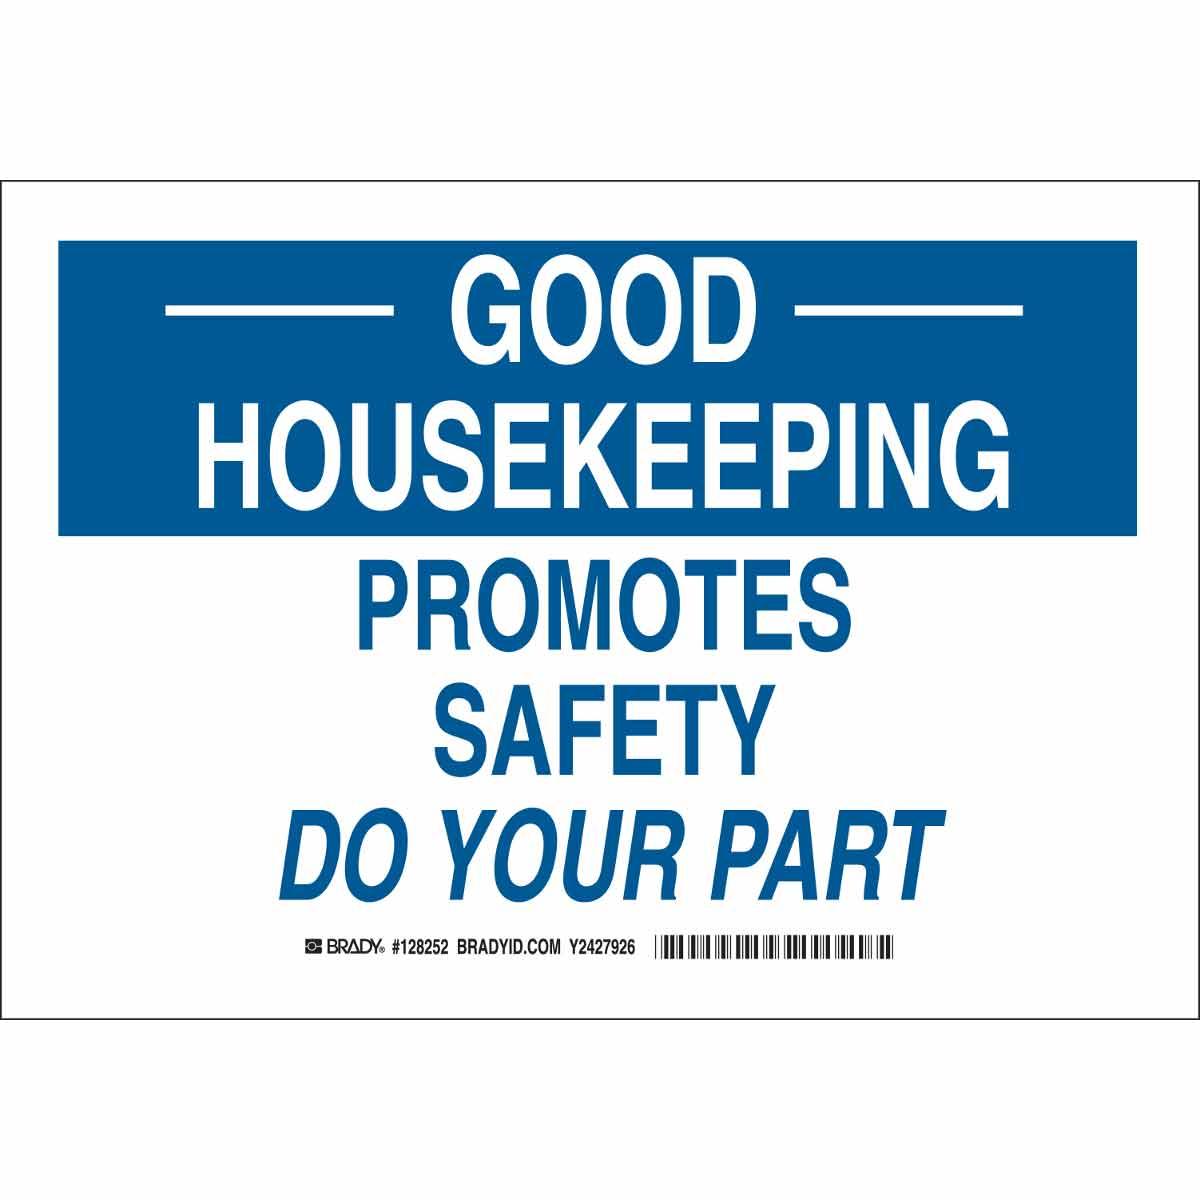 Good Housekeeping: GOOD HOUSEKEEPING Promotes Safety Do